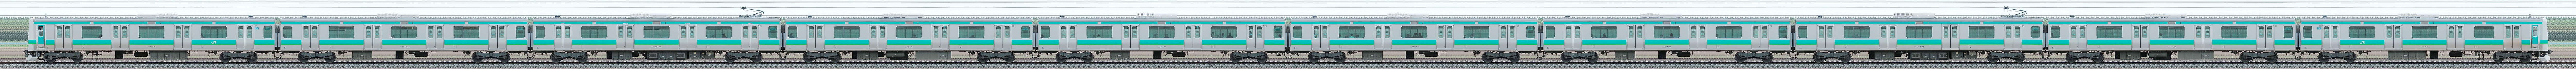 JR東日本 常磐快速線 E231系マト114編成(山側)の編成サイドビュー